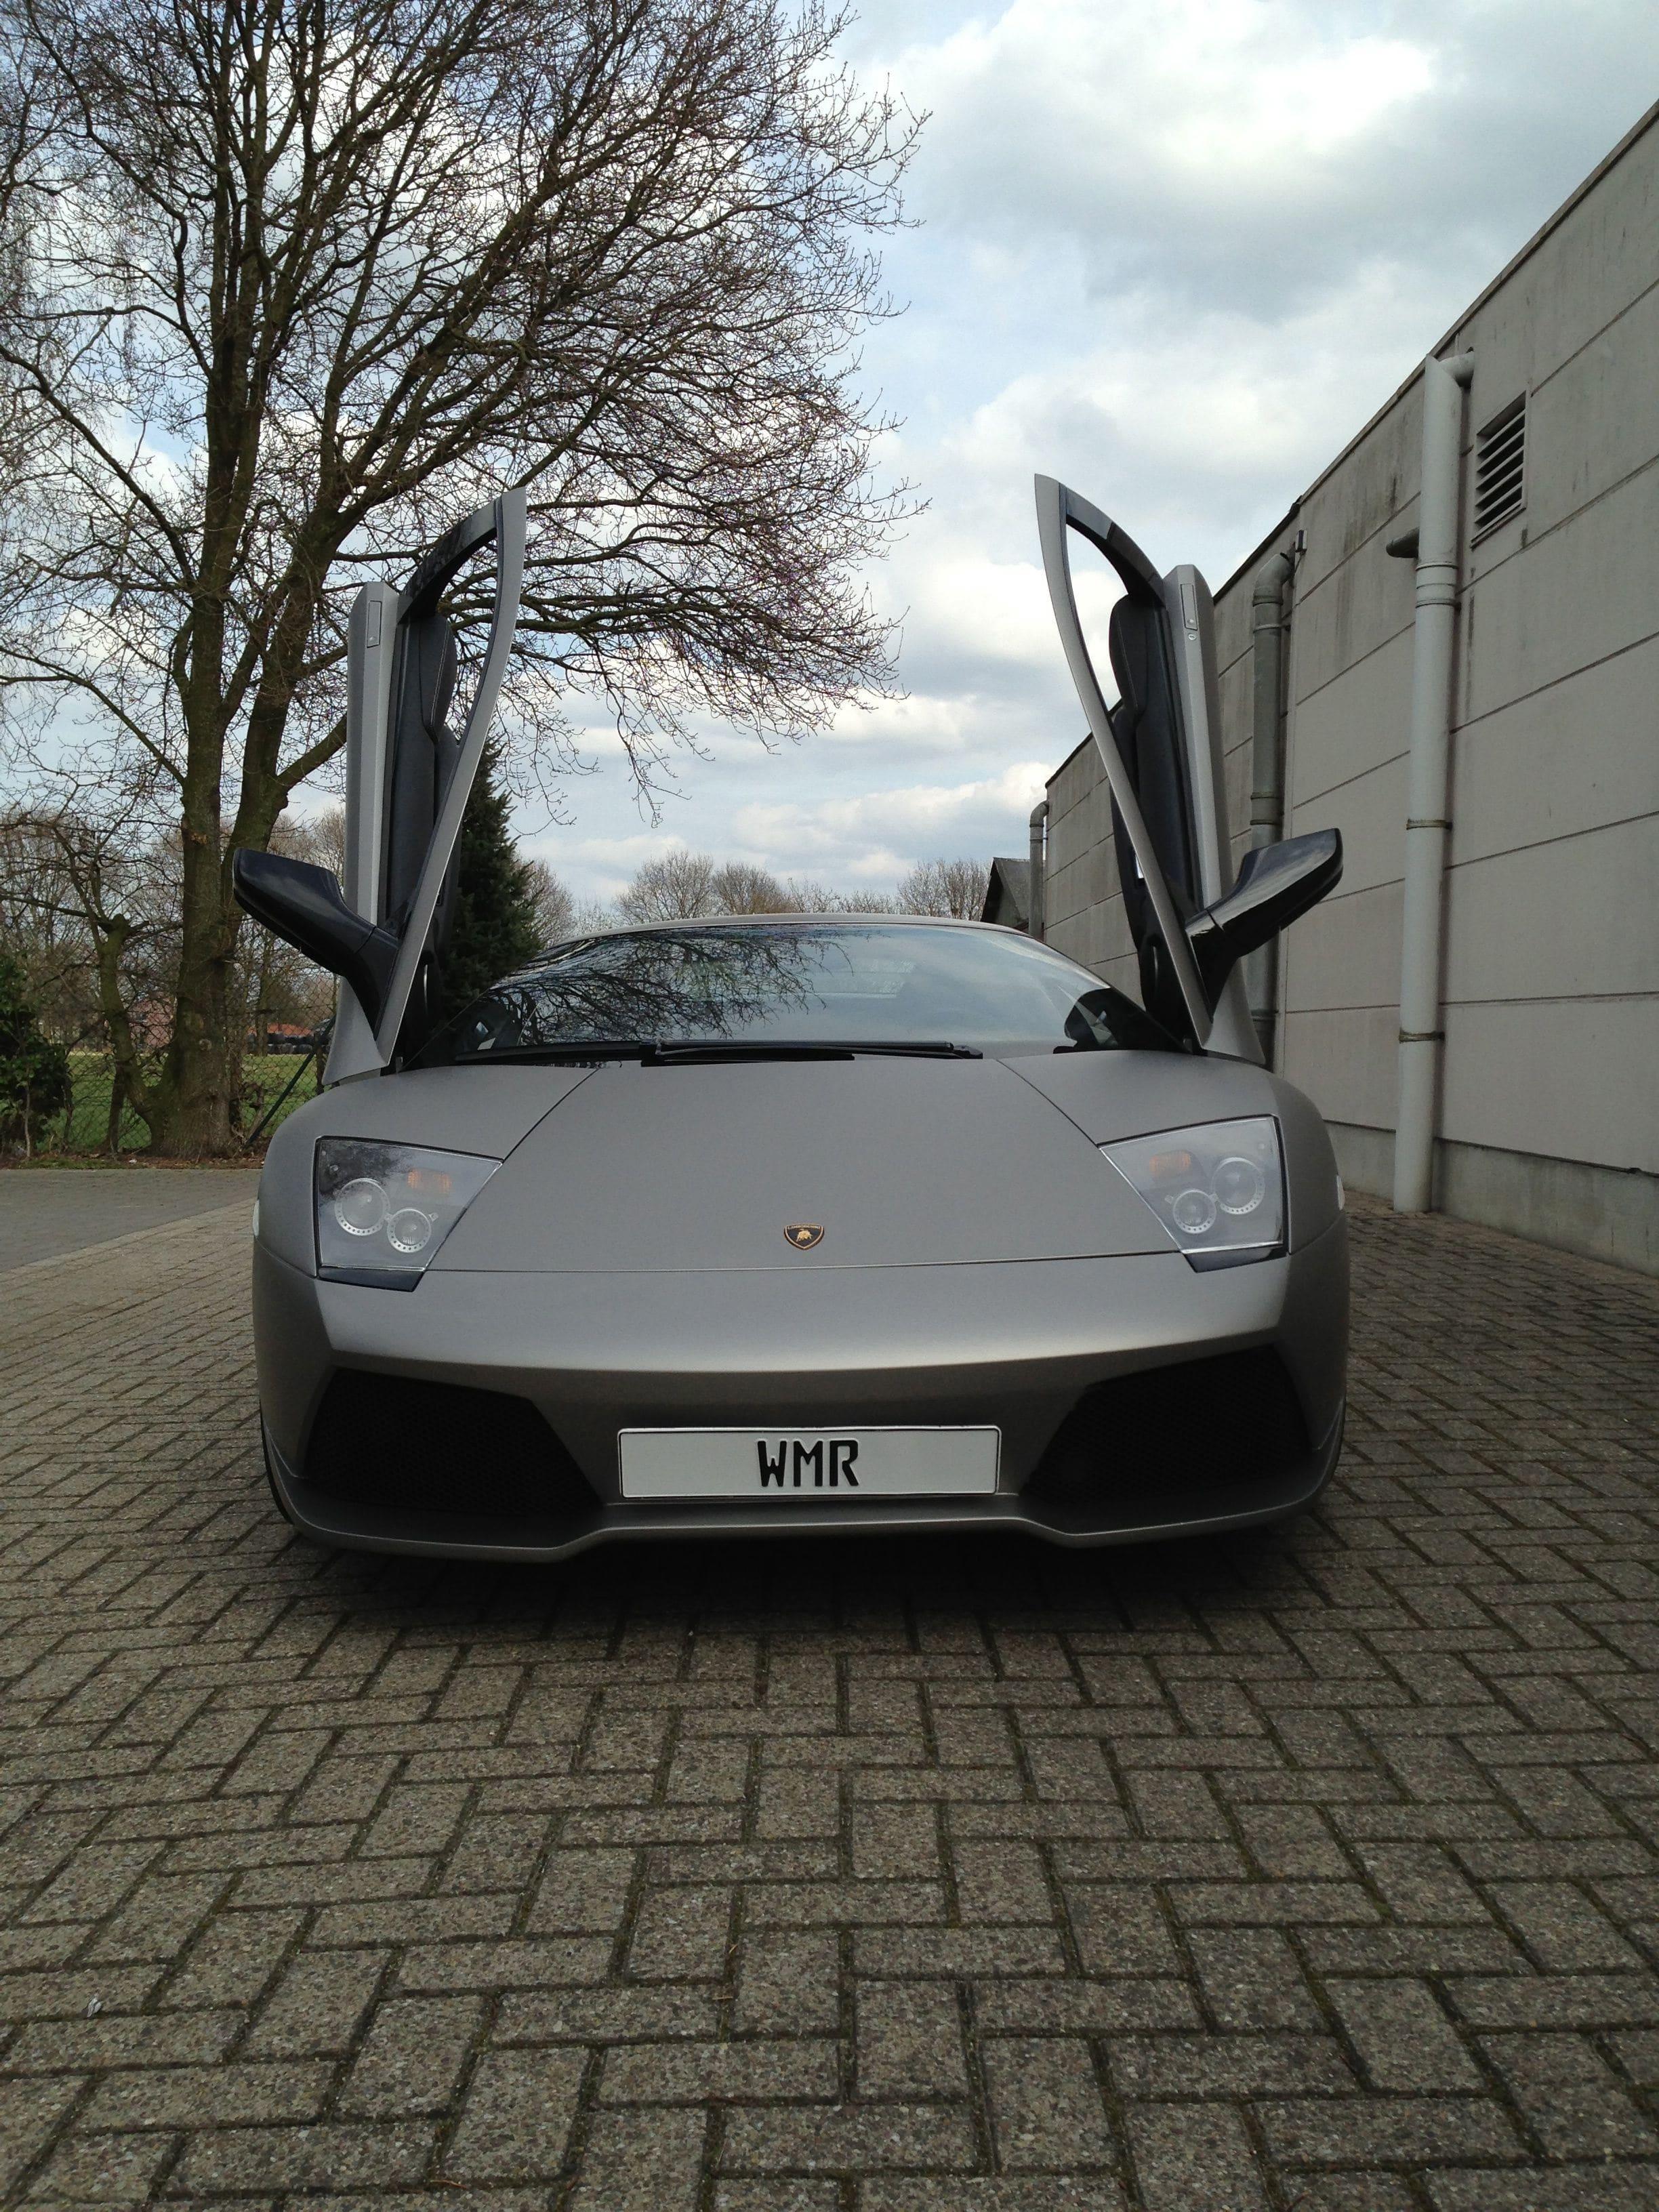 Lamborghini Murcialago LP670 met Gunpowder Wrap, Carwrapping door Wrapmyride.nu Foto-nr:5980, ©2021